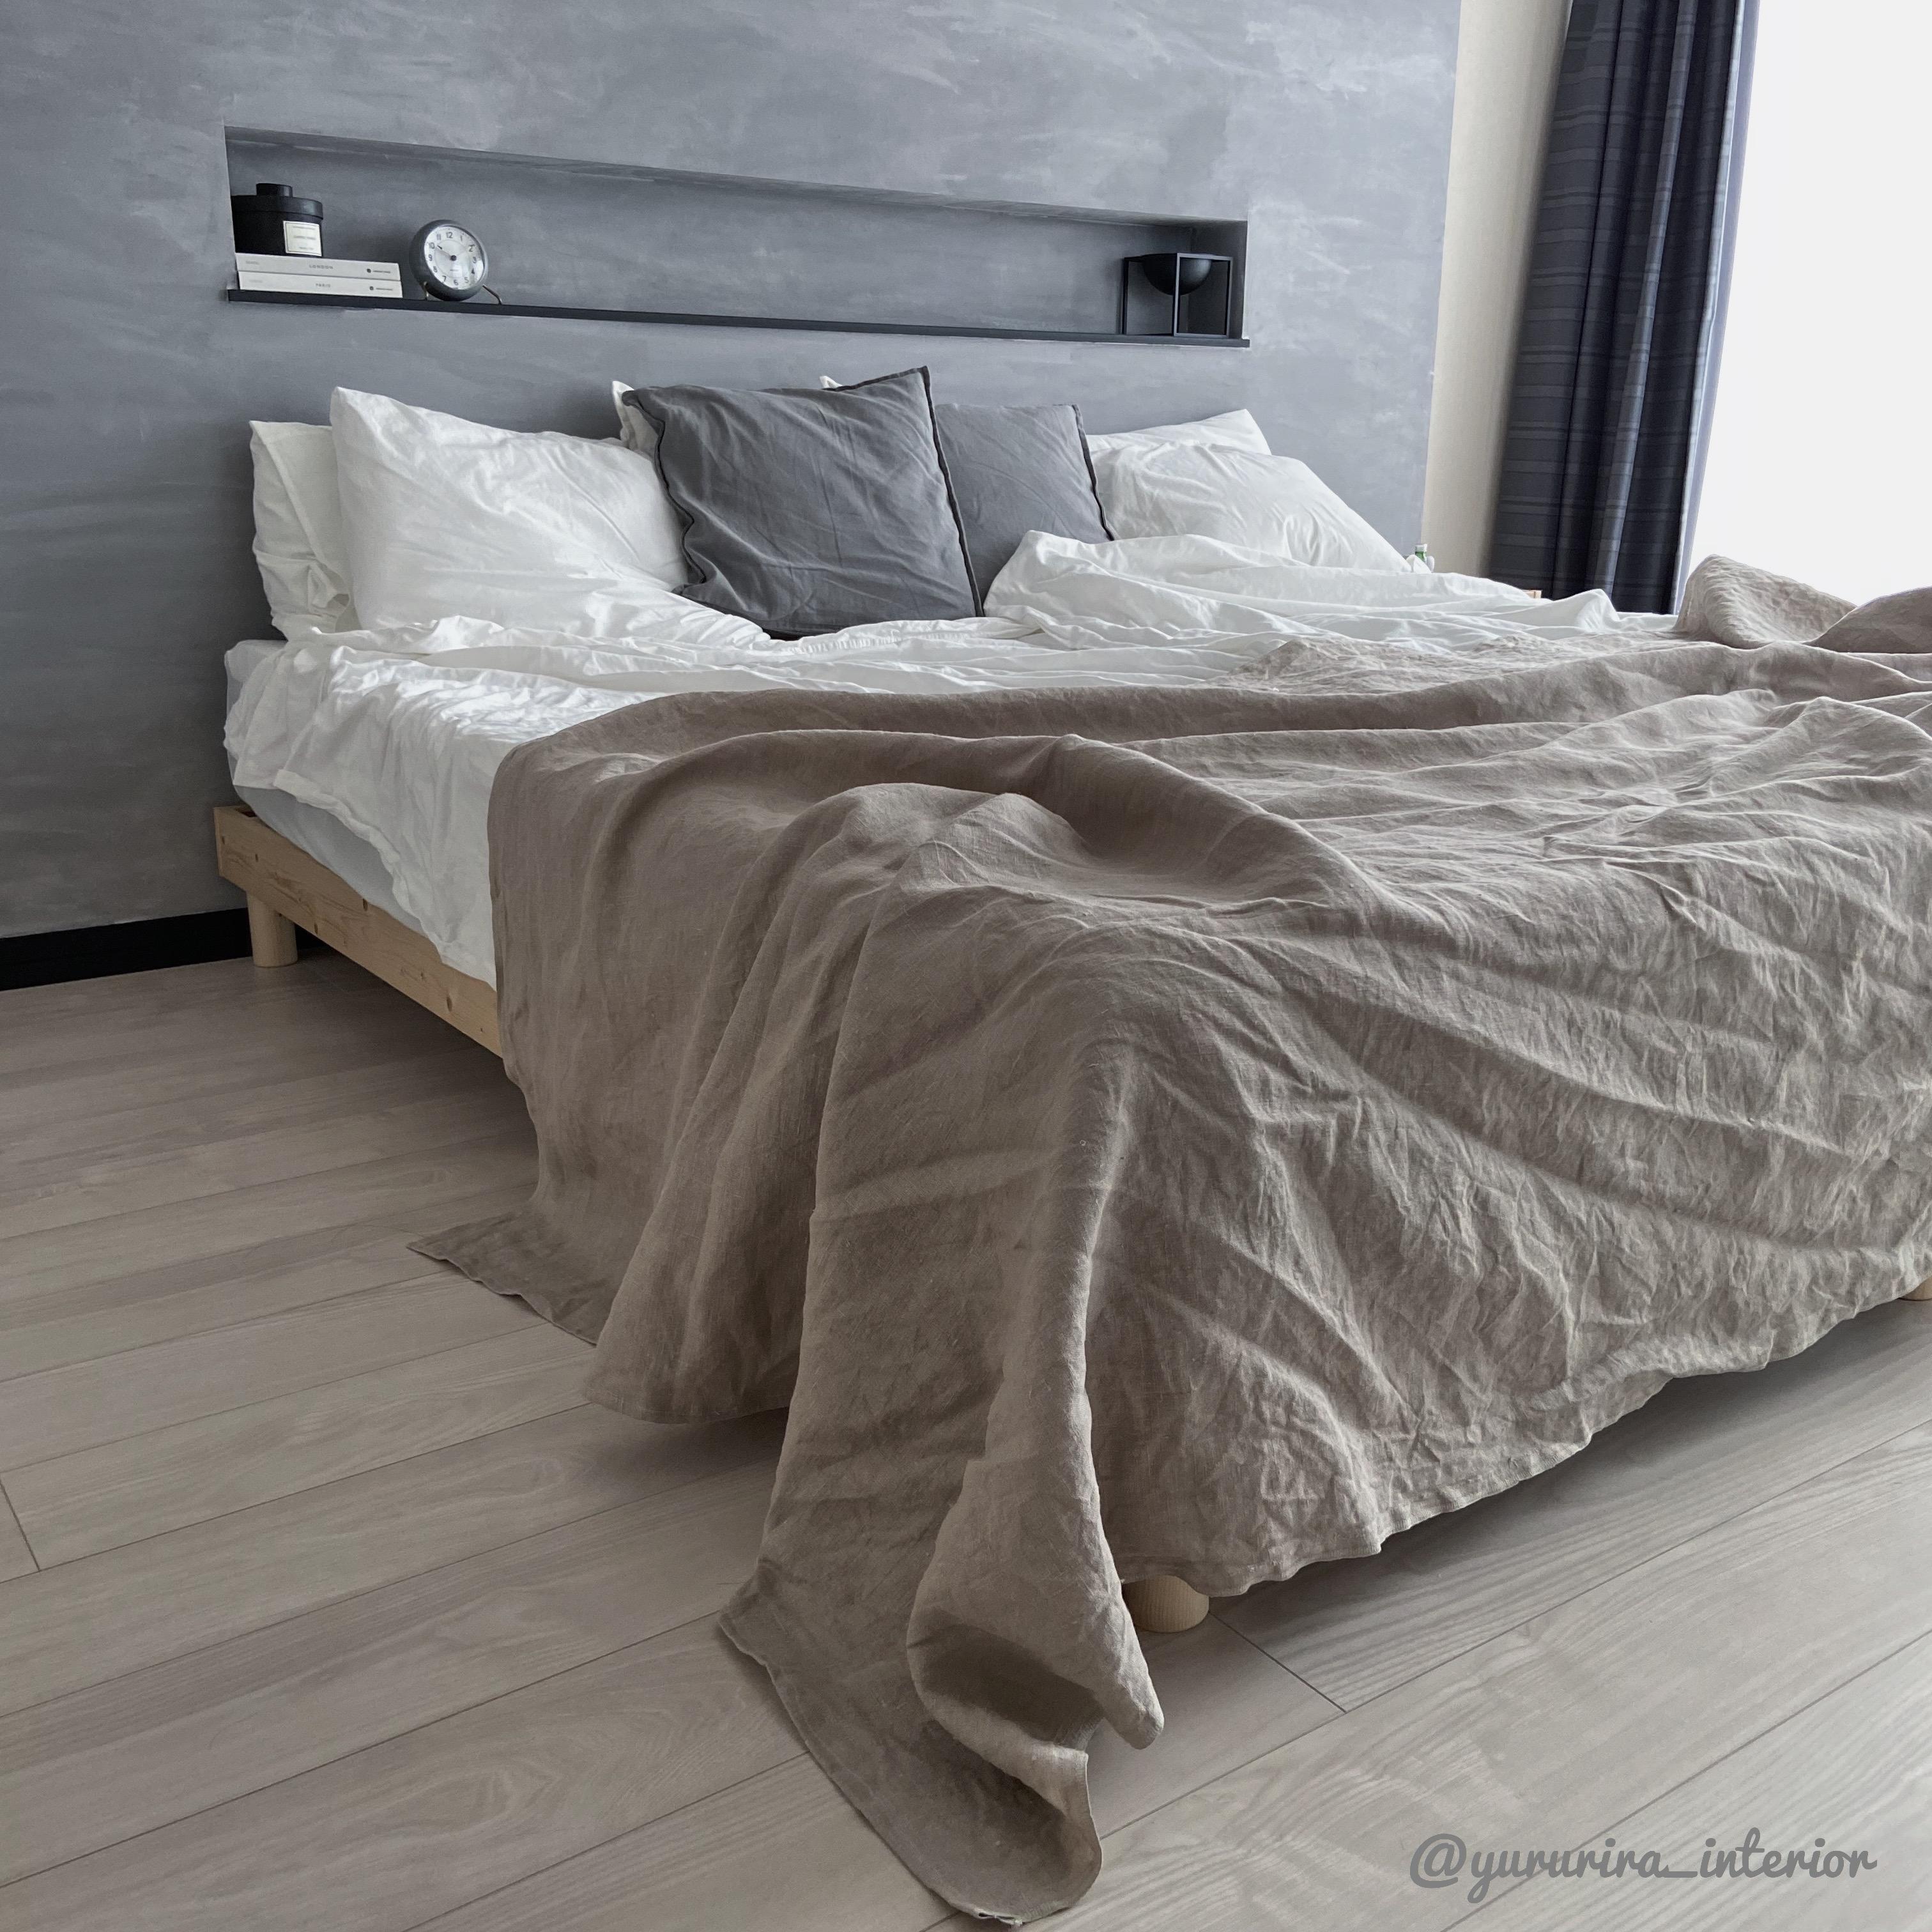 IKEAで生地を初購入!ナチュラルリネンのベッドカバーをハンドメイド♪